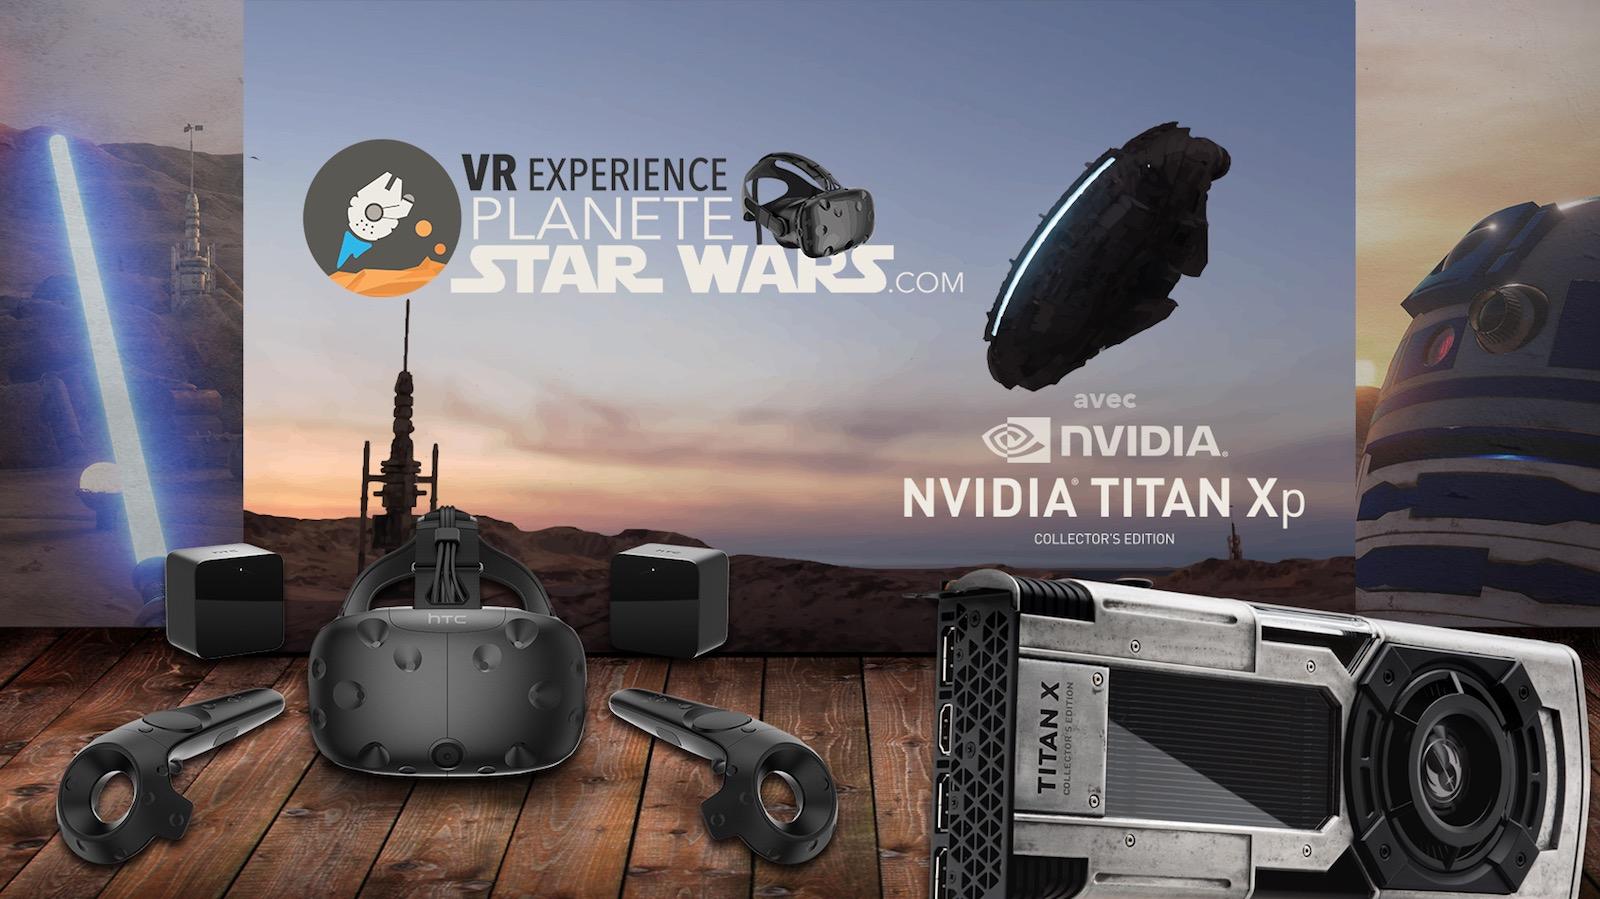 Planete-StarWars.com VR Experience, Immergez-vous dans Star Wars !